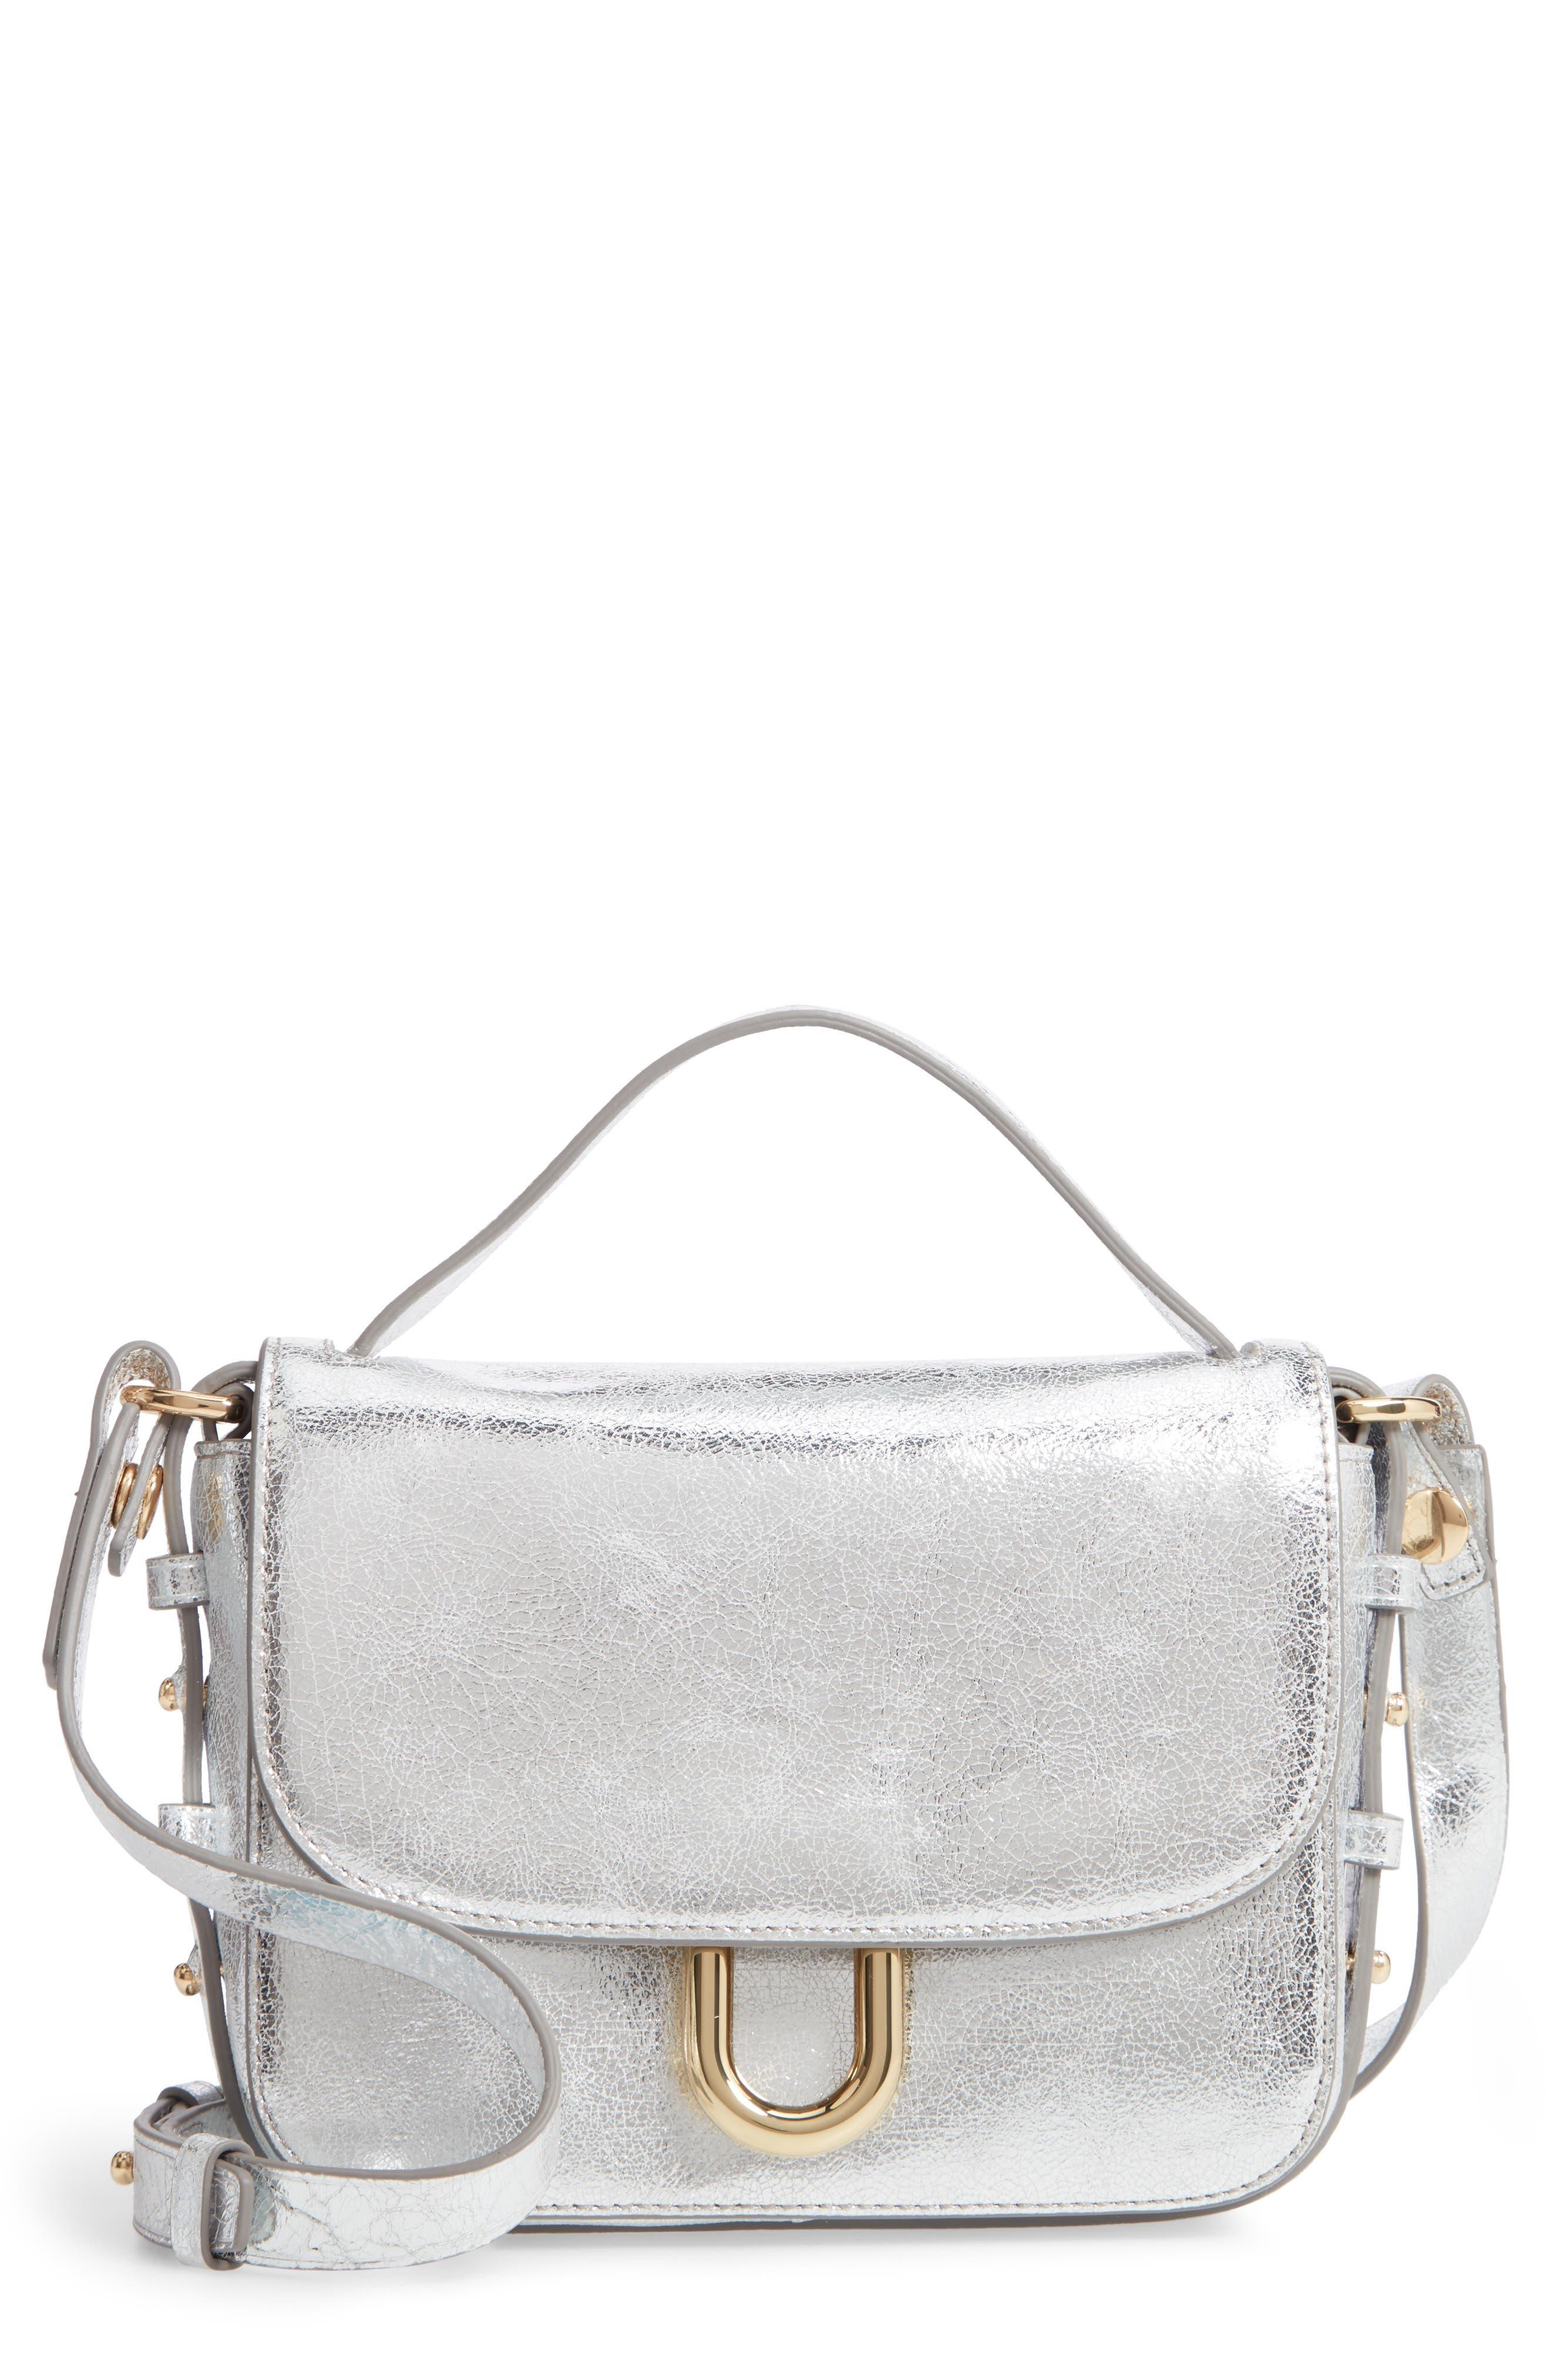 Harper Metallic Leather Crossbody Bag, Main, color, METALLIC SILVER